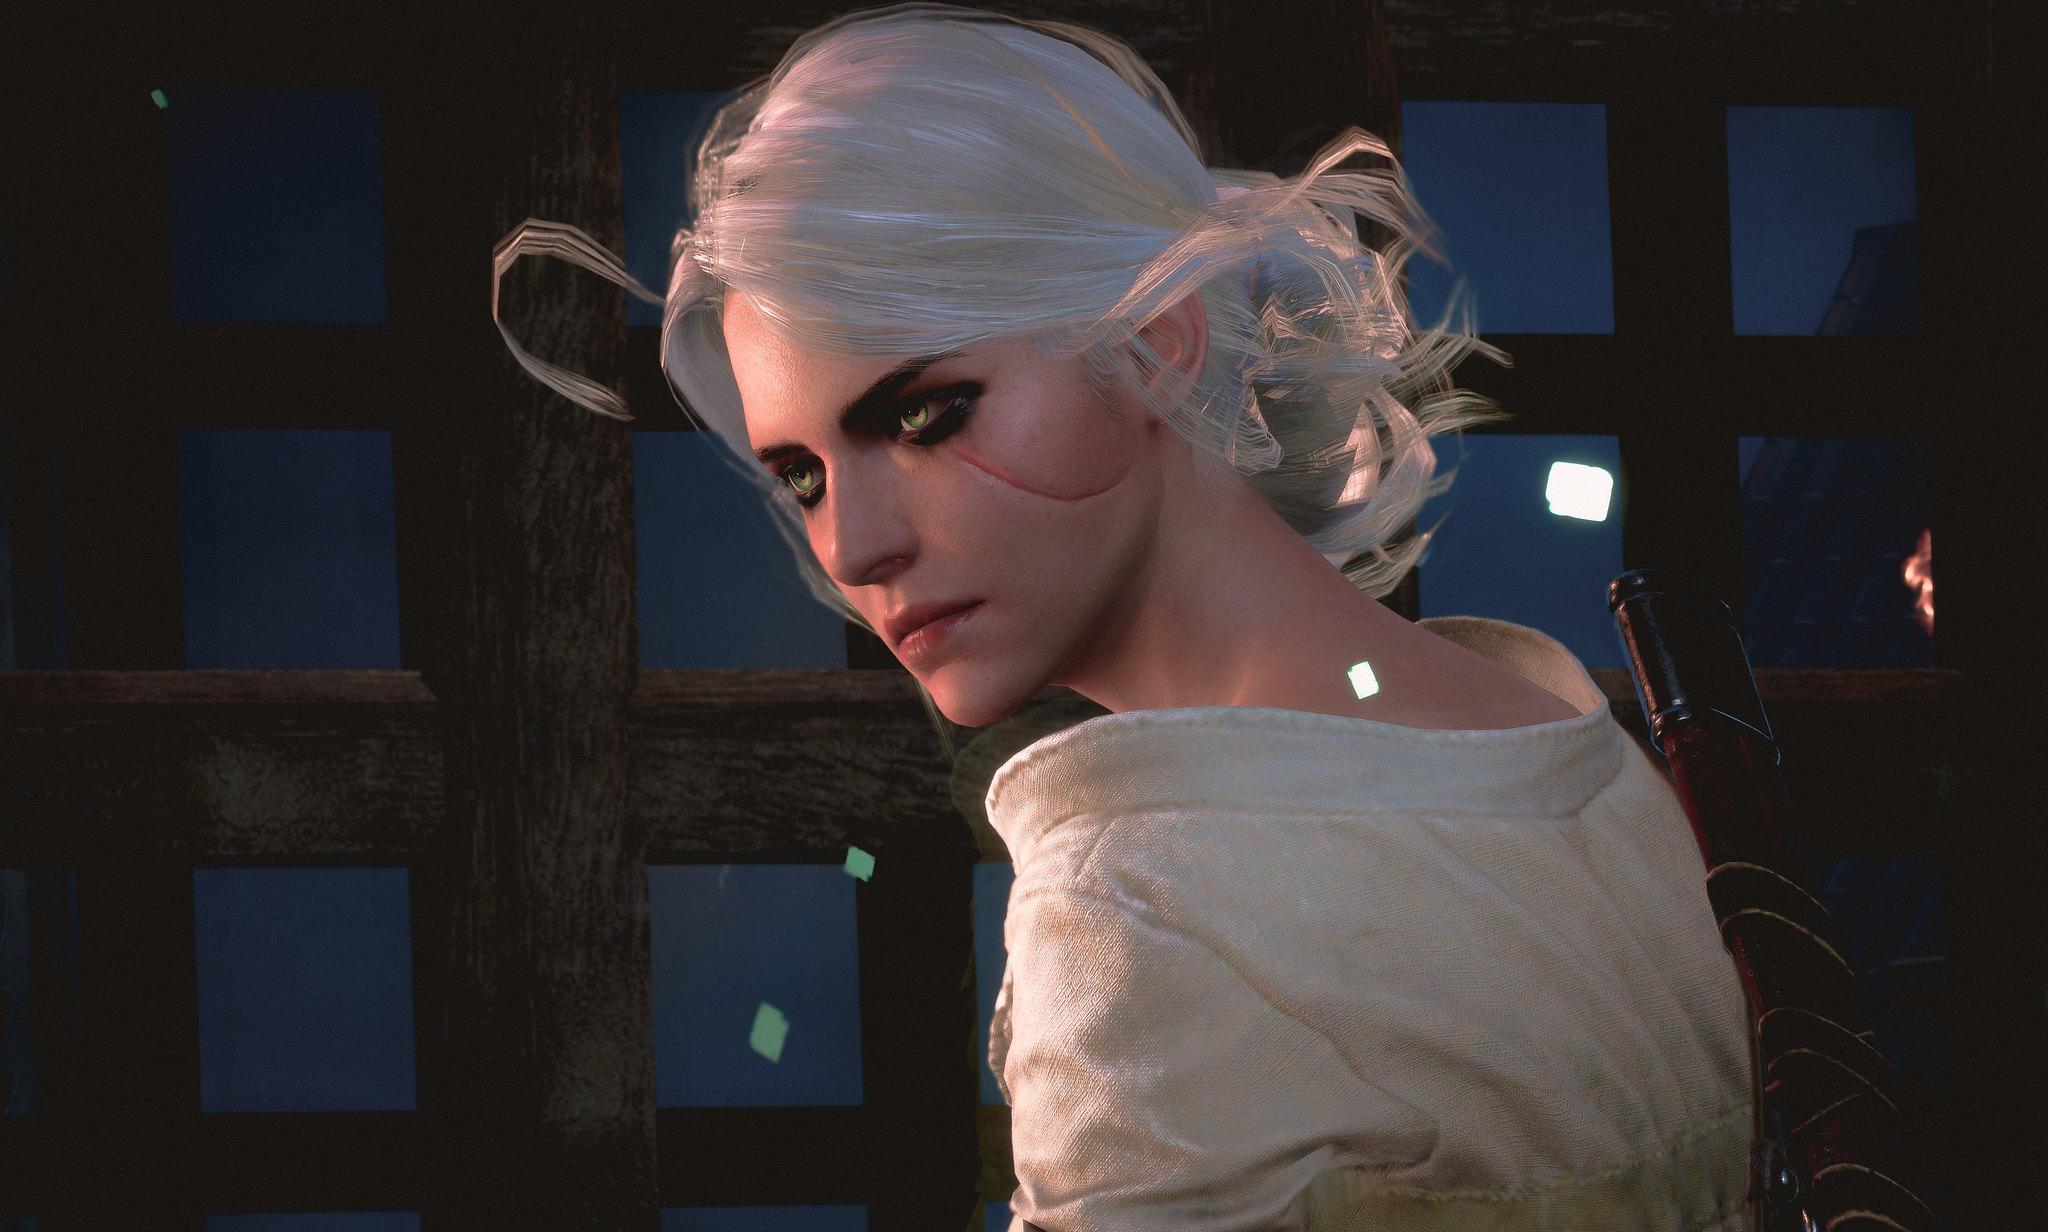 21697163498_680f27ce2e_k.jpg - The Witcher 3: Wild Hunt